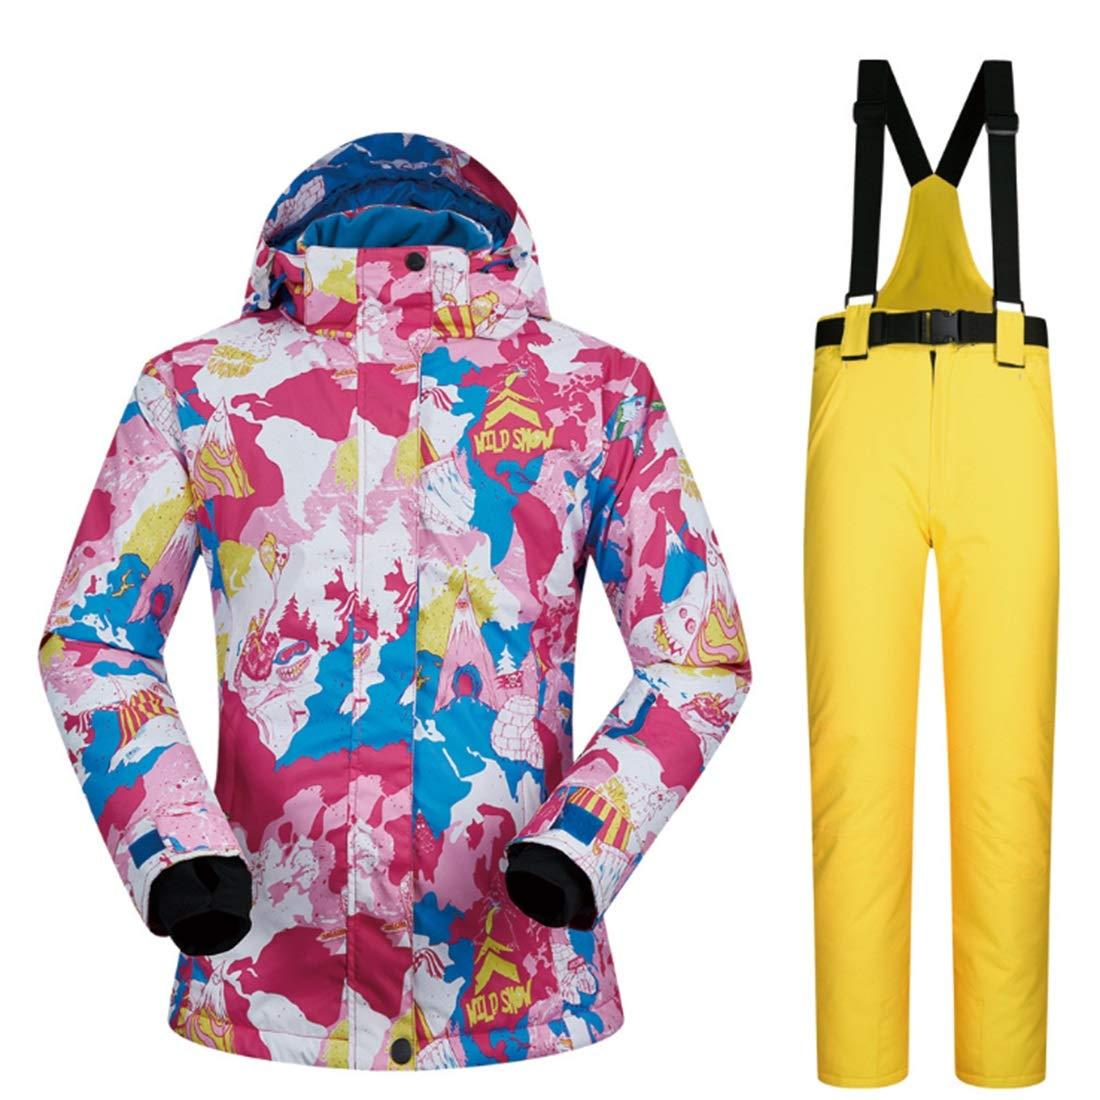 1 Sububblepper Women Jacket Winter Girl Coat Outdoor Sport Dress Ski Jacket Below Zero Coat (color   07, Size   M)